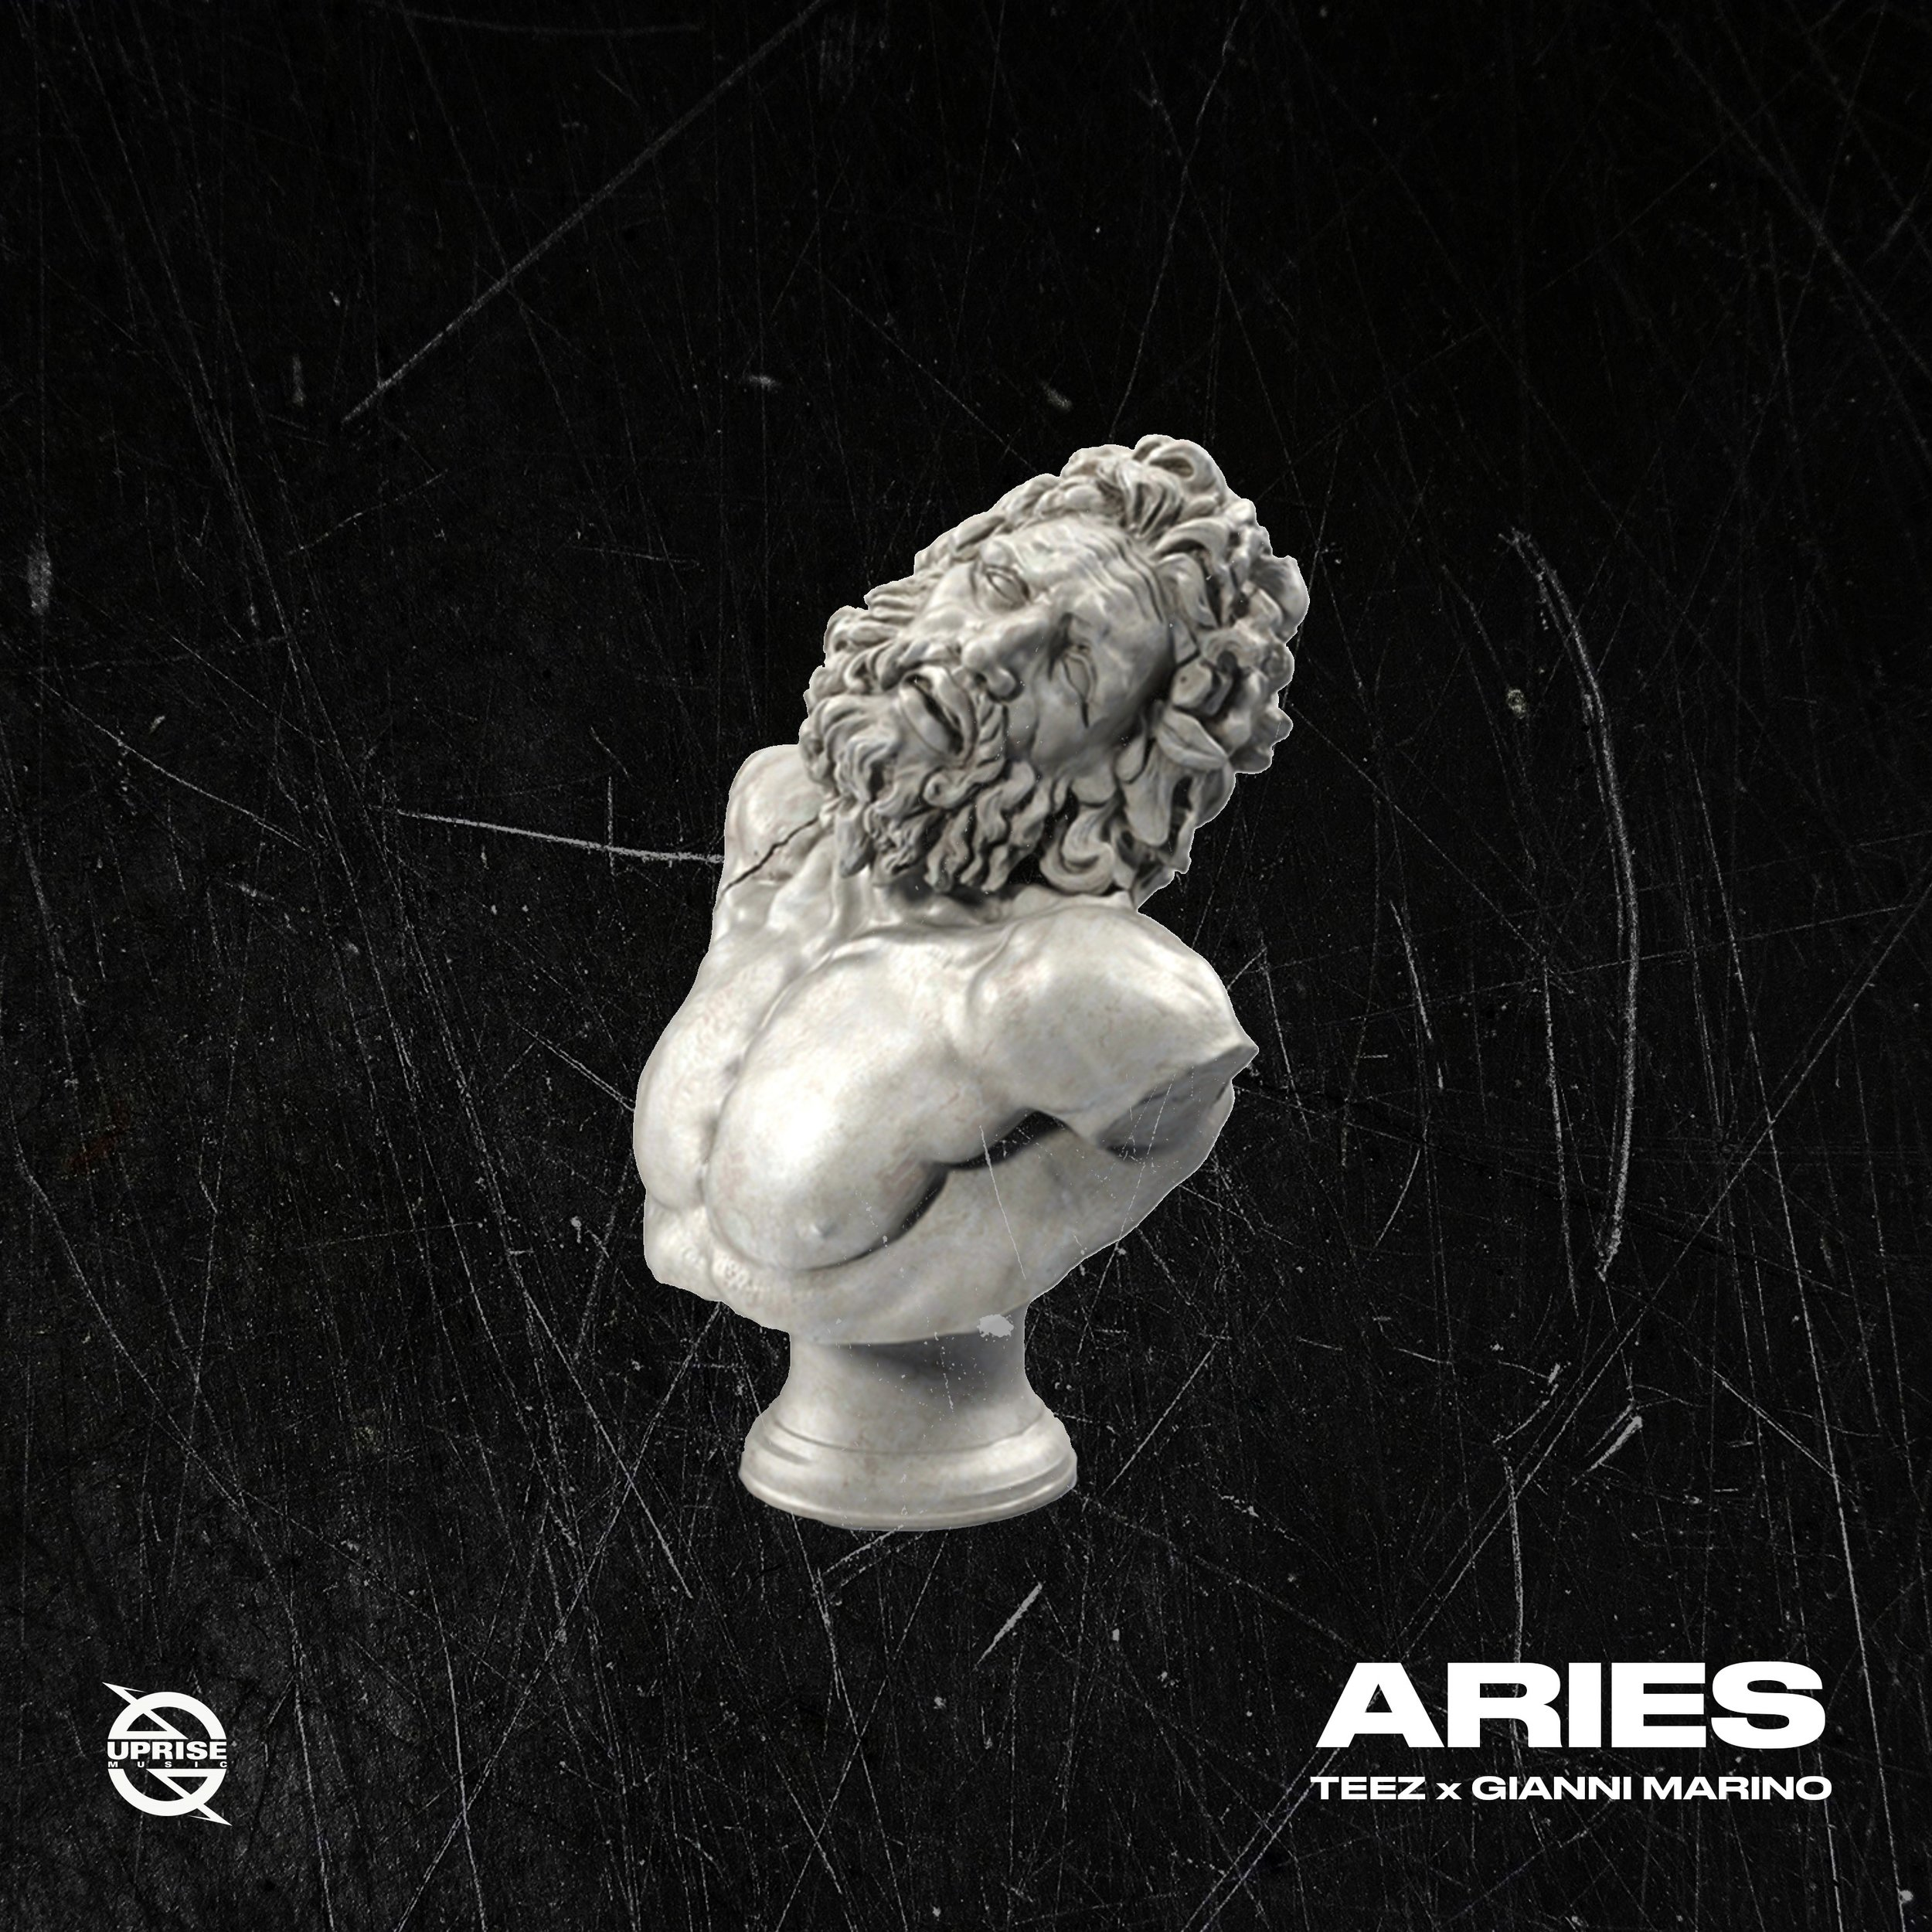 Teez x Gianni Marino - Aries